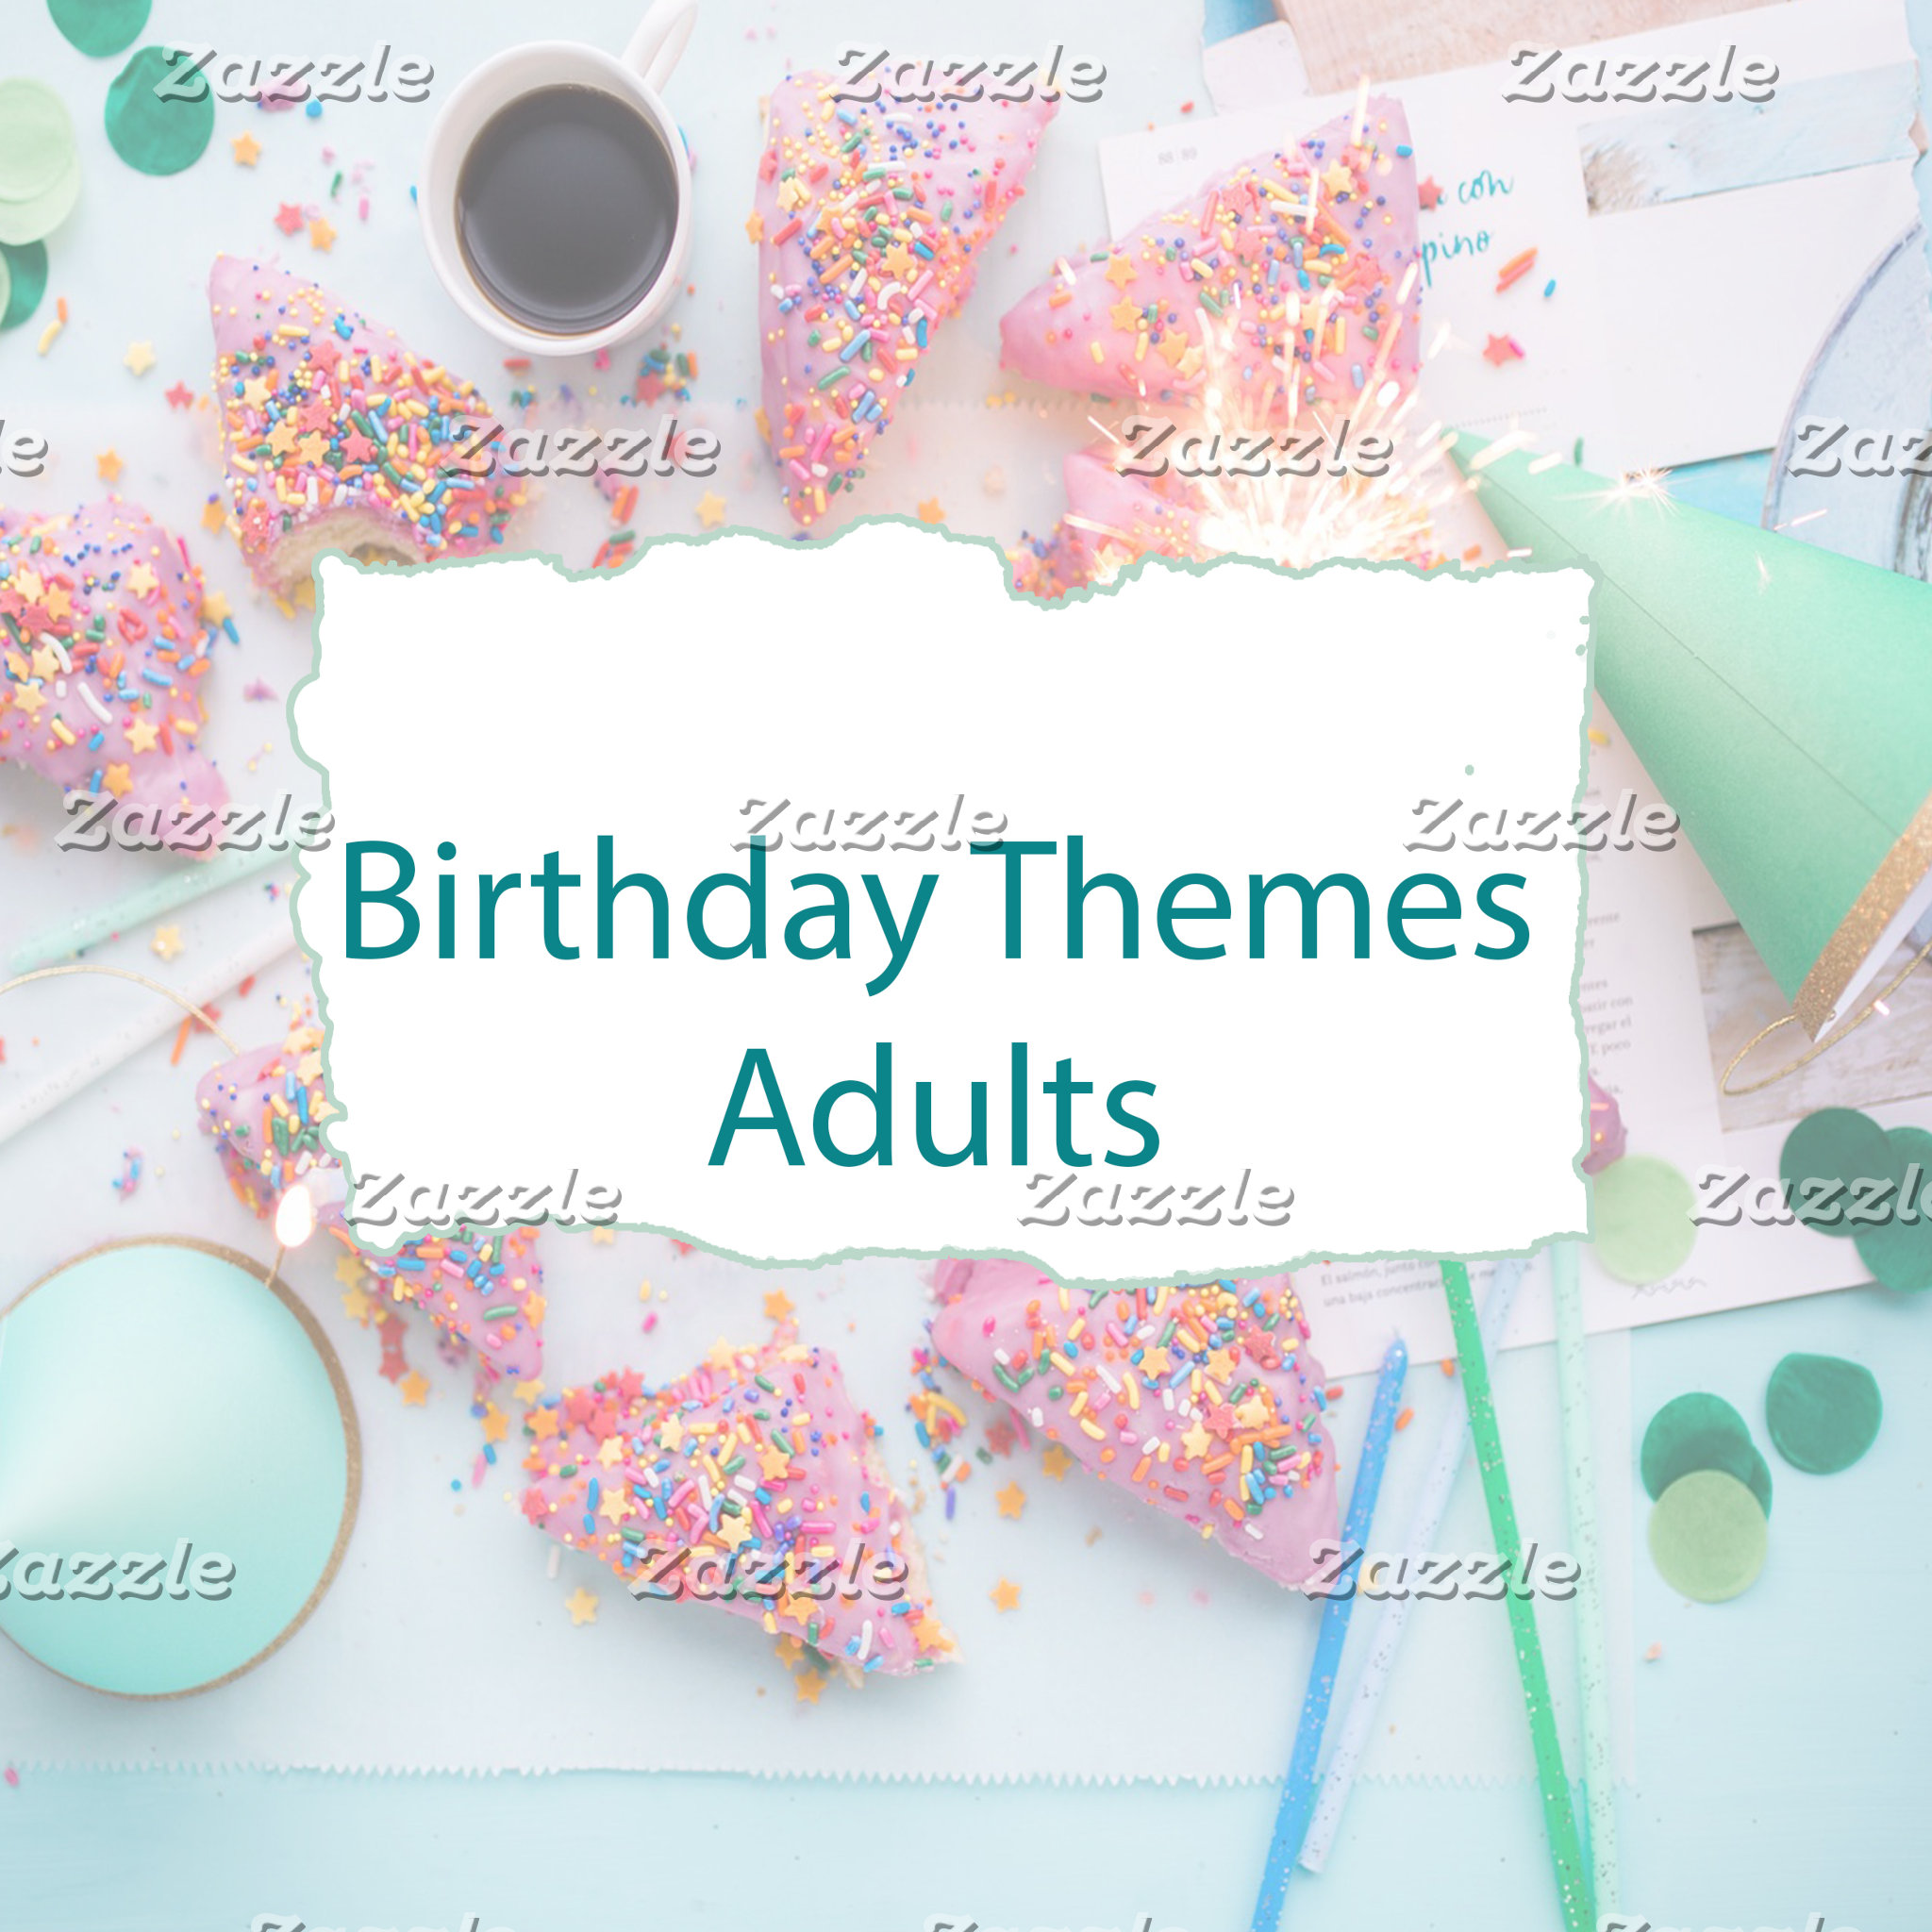 Birthday Themes Adults